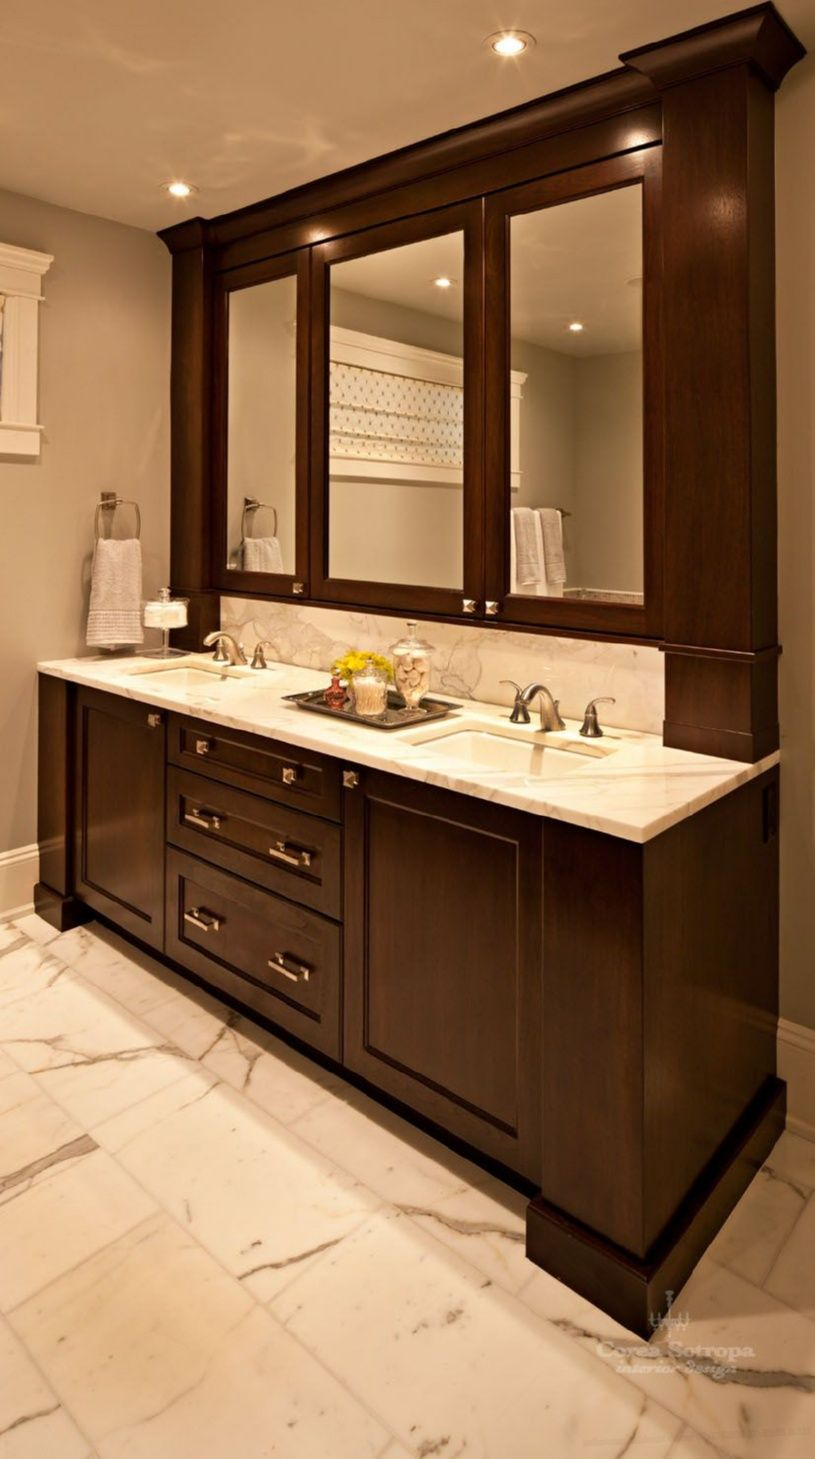 Eberhart Salle De Bain ⇒ quality stylish bathroom cabinets. ok - i love this!!! i